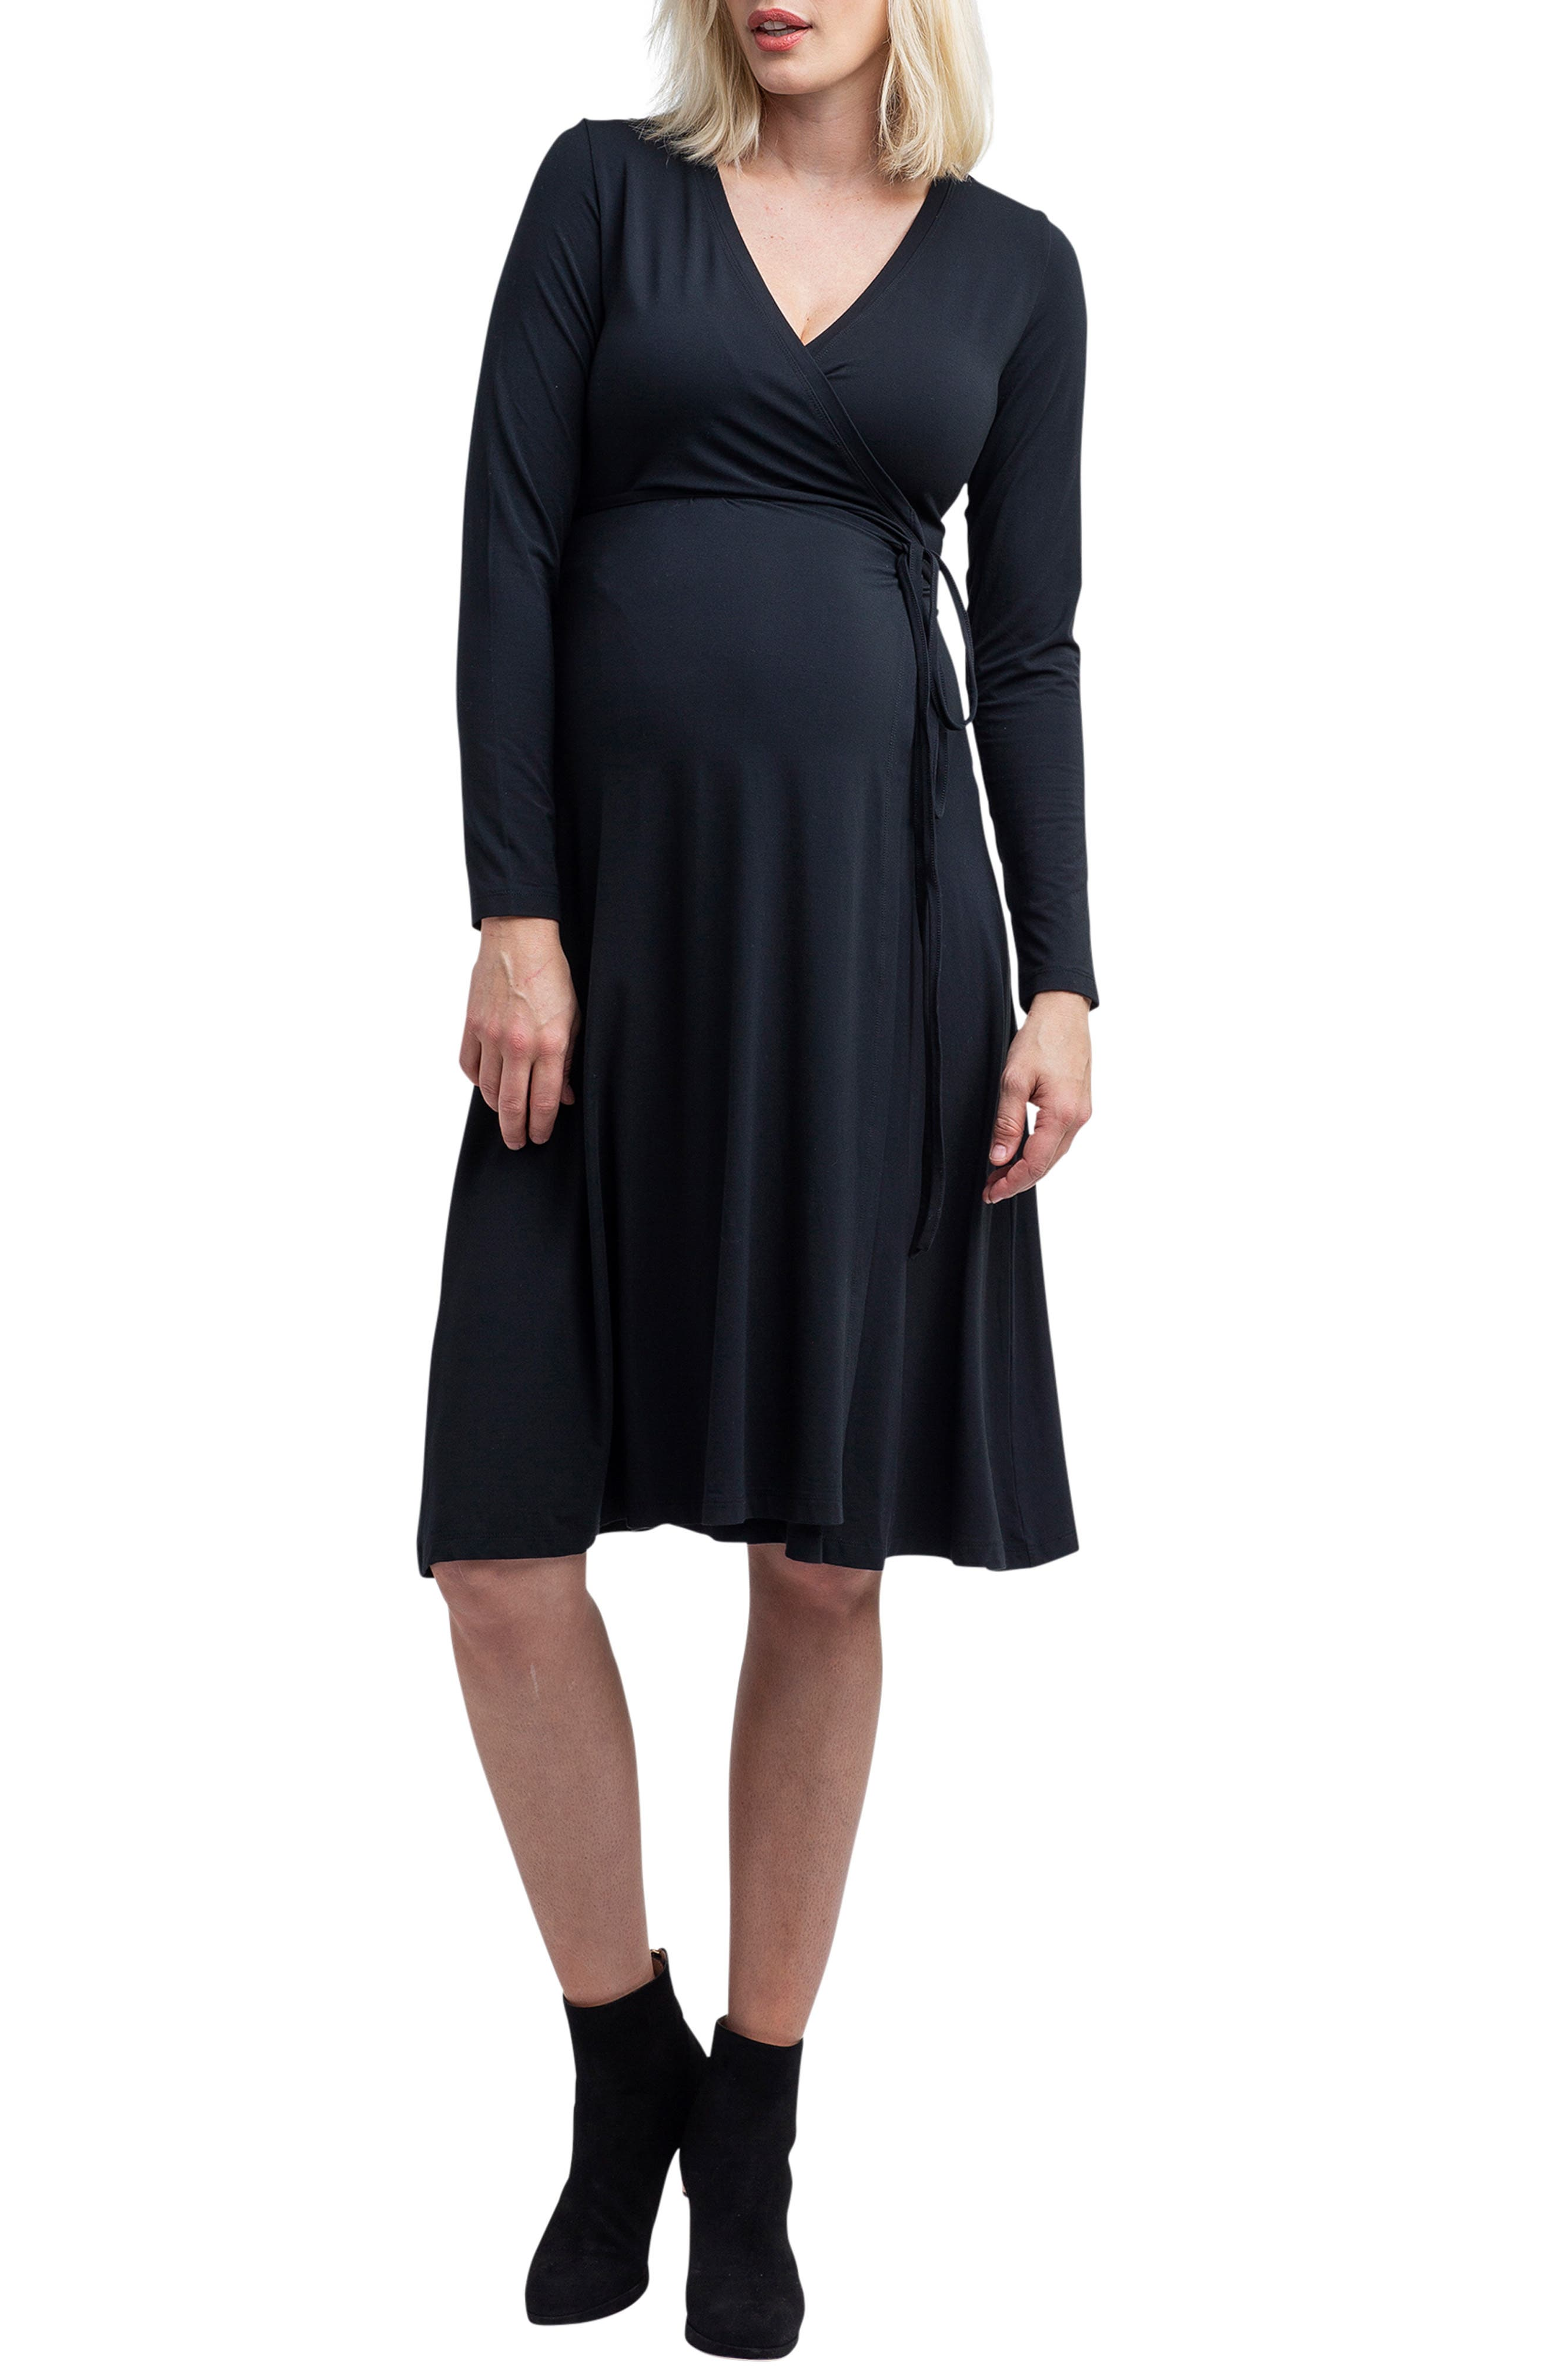 Tessa Jersey Maternity/Nursing Wrap Dress,                             Main thumbnail 1, color,                             BLACK